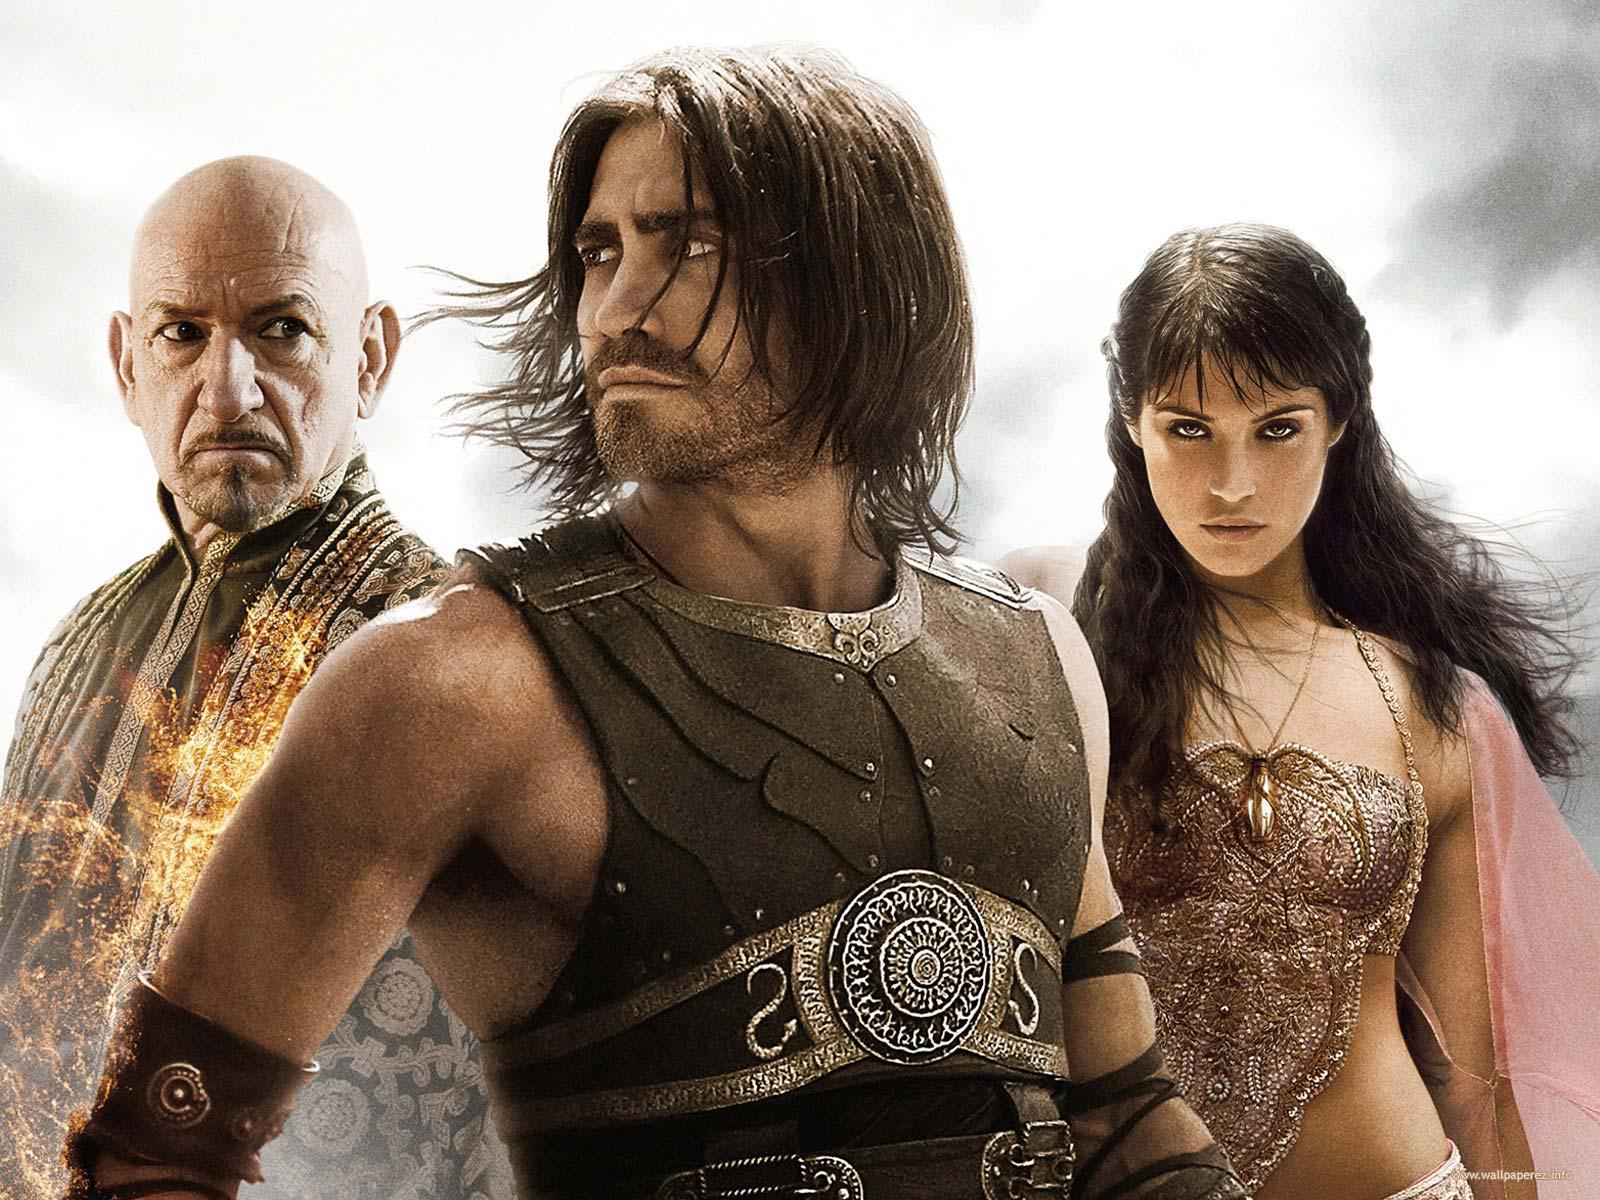 Amazing Wallpaper Movie Prince Persia - mgU2RkA  Photograph_108792.jpg